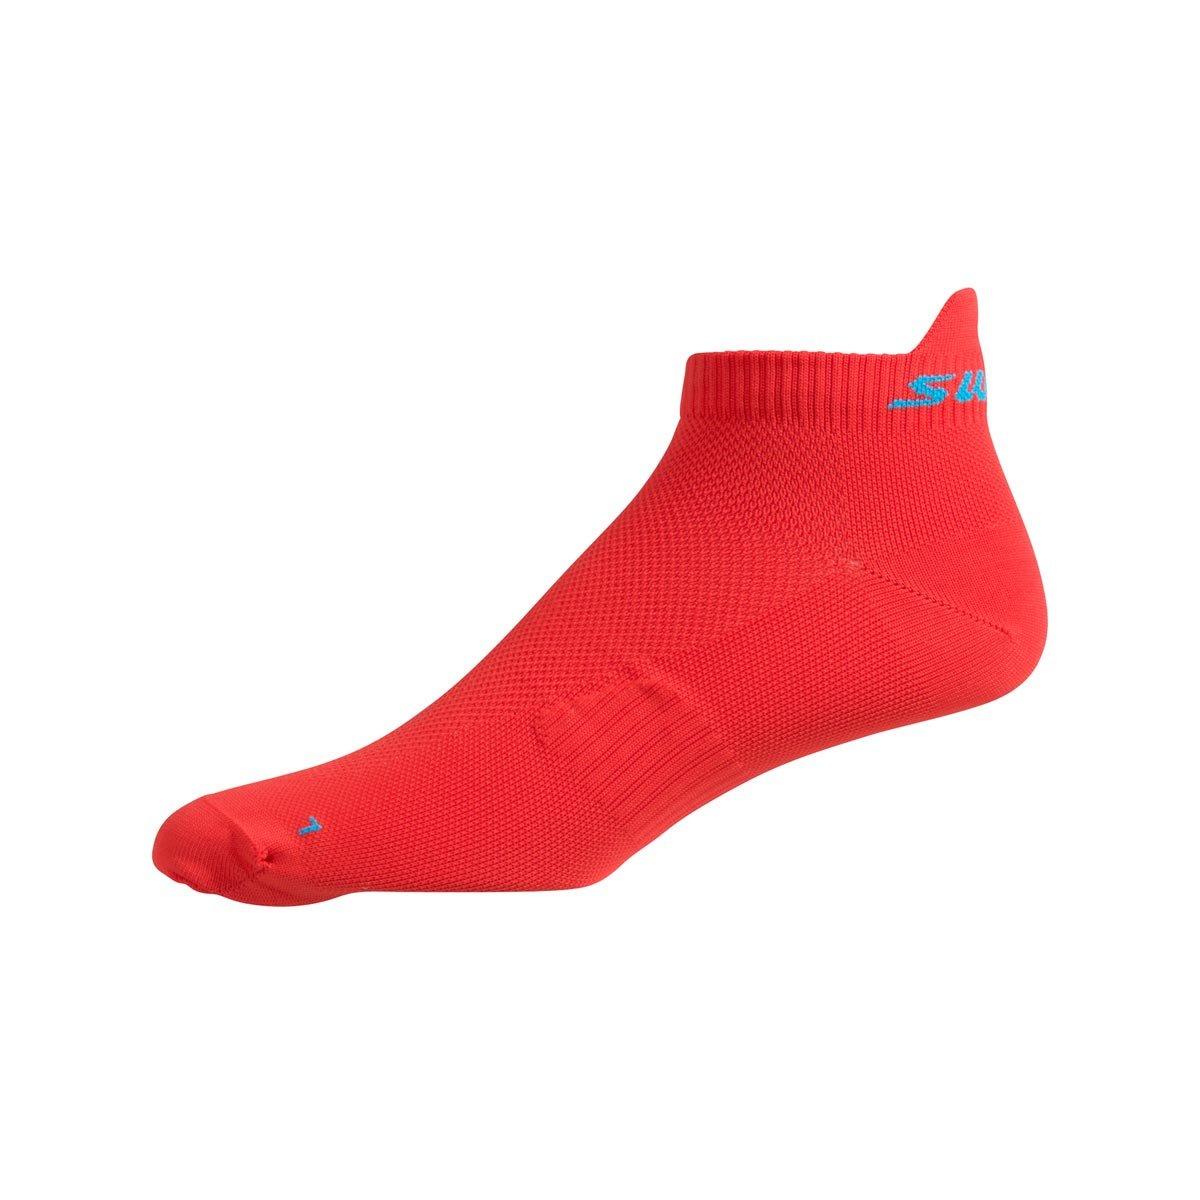 Sportovni ponozky artis 40 42  8b9f0e83c1